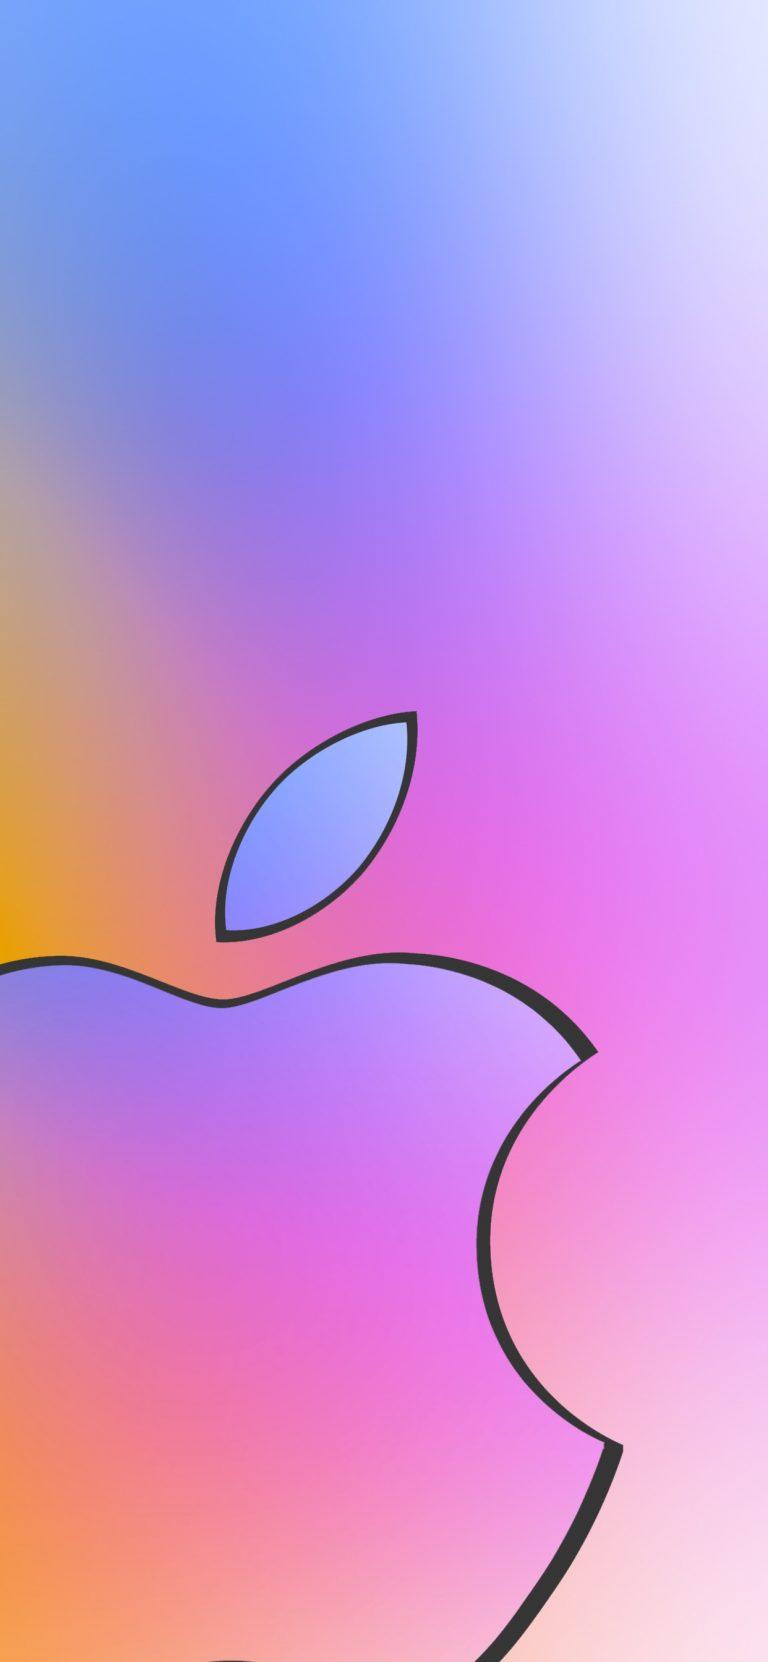 Apple Card Wallpaper 08 1242x2688 768x1662